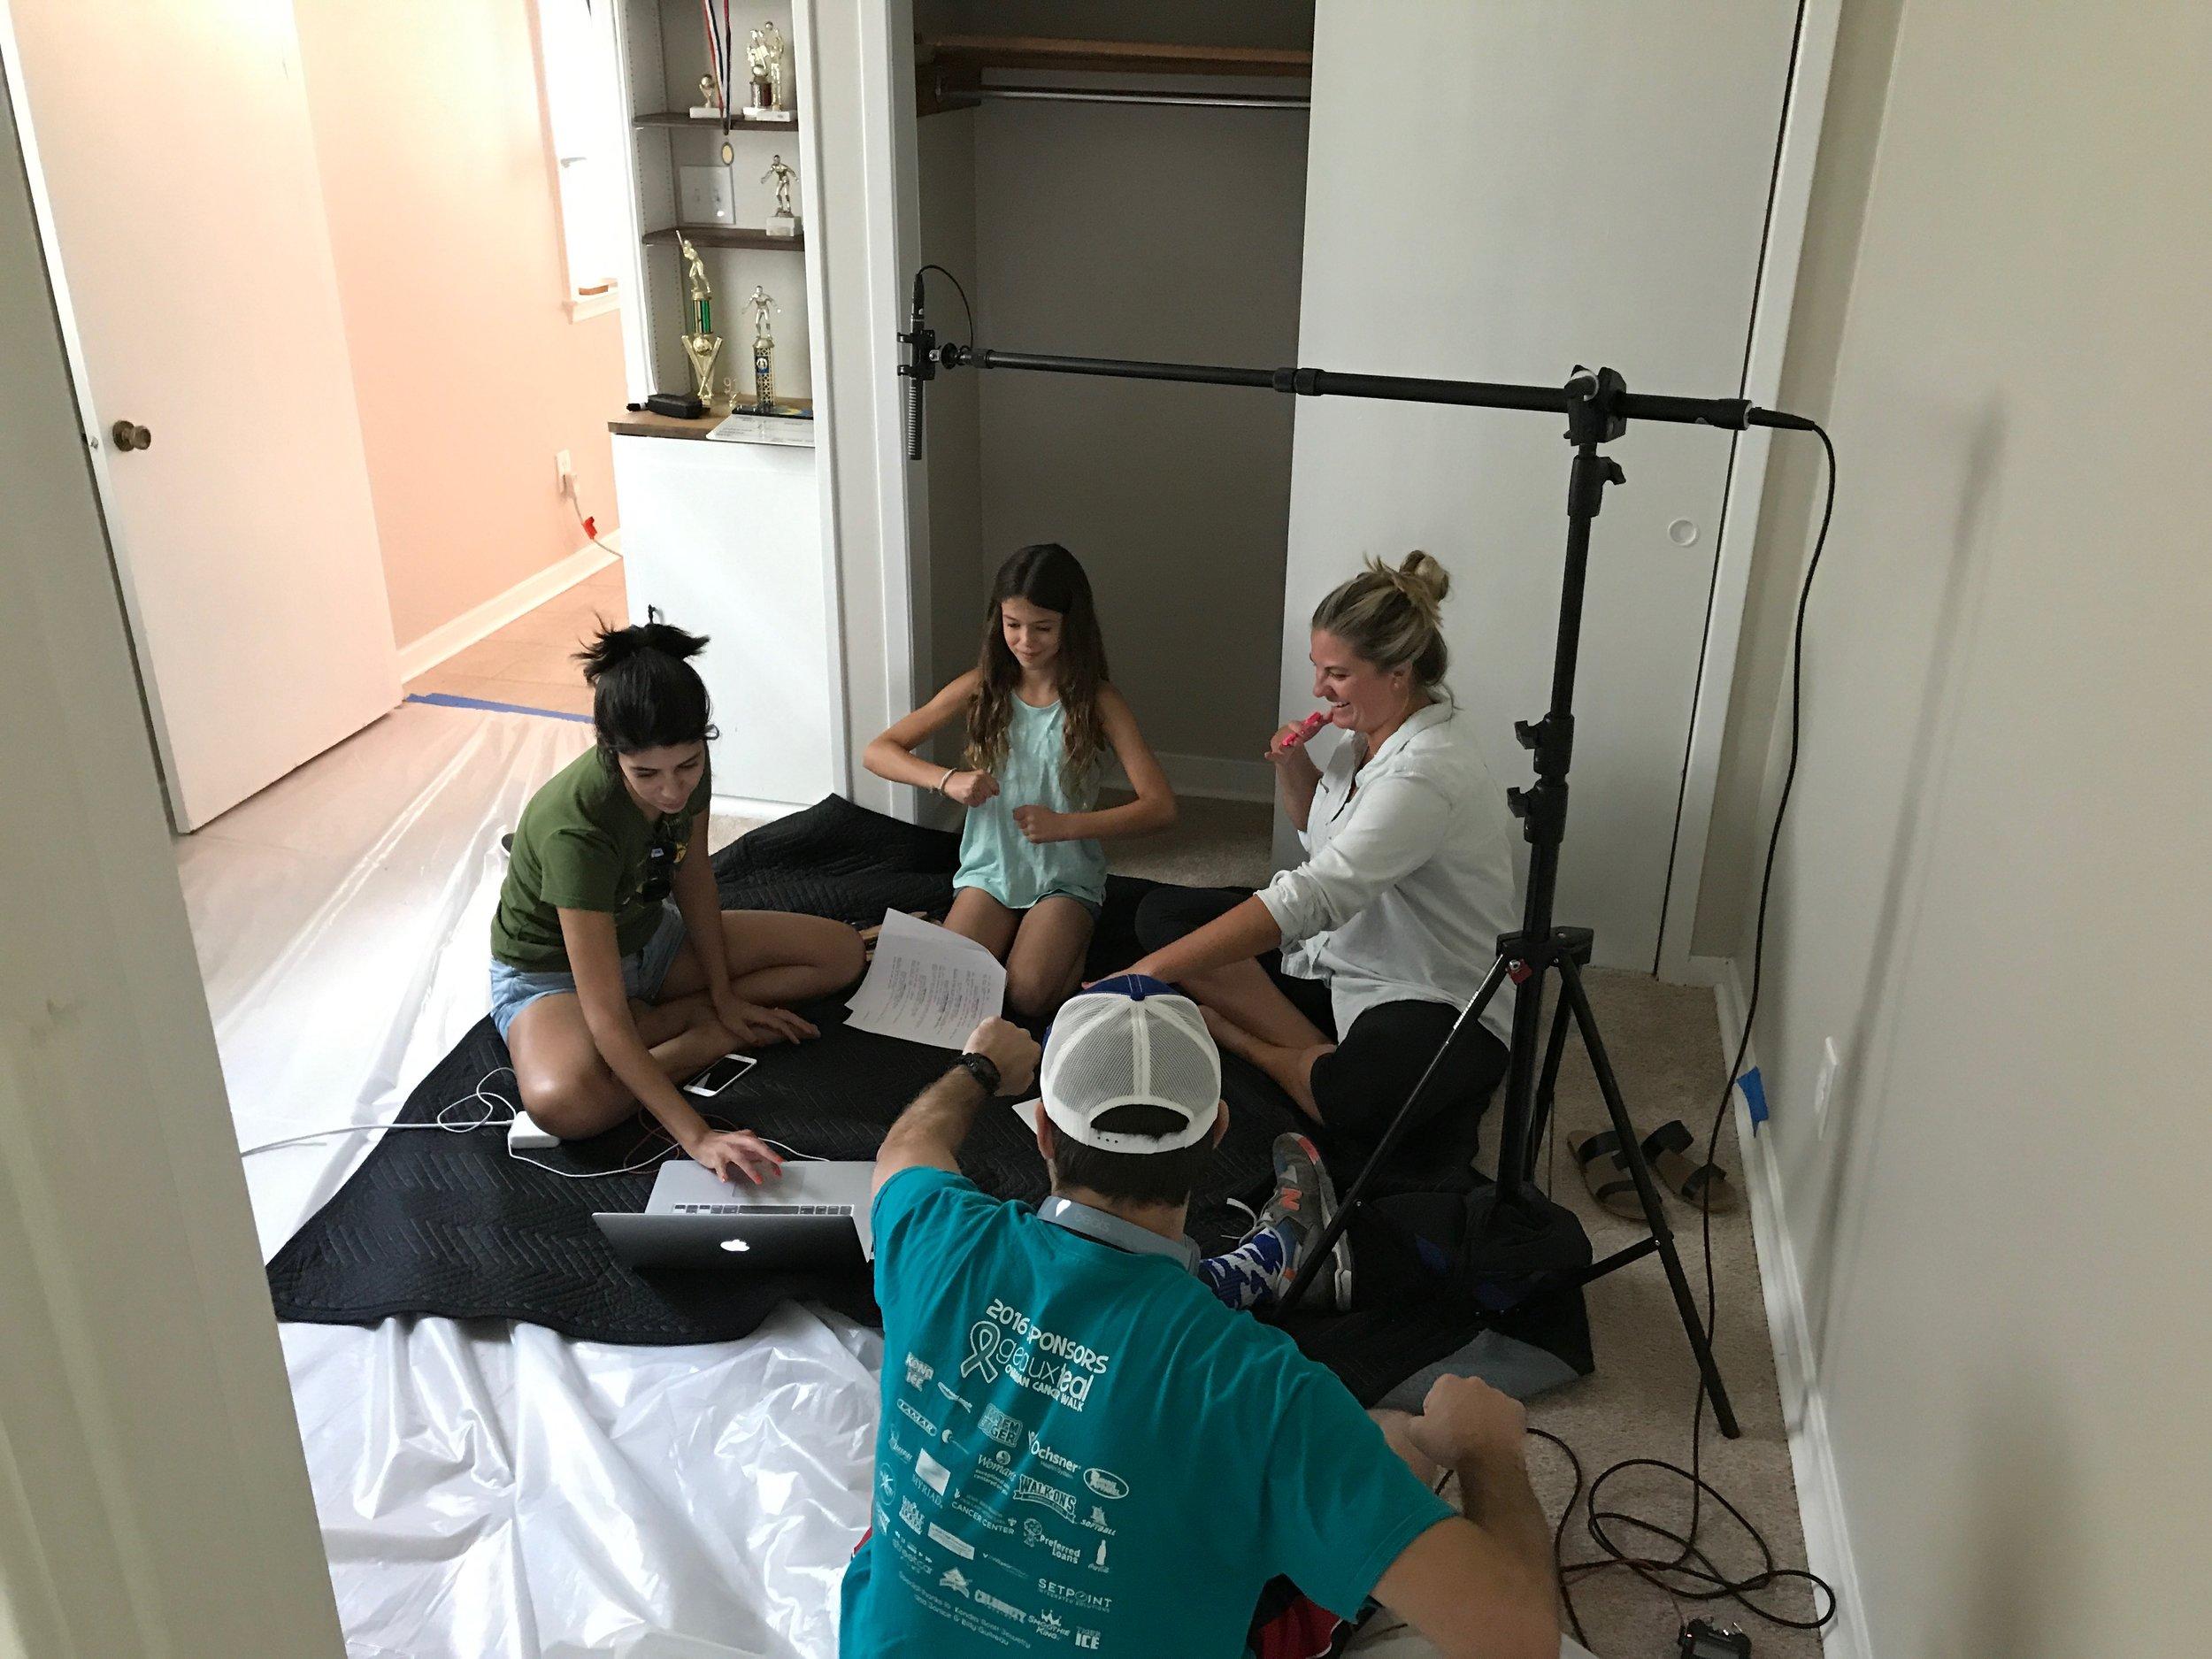 48 Hour Film Project - StreetCar Films